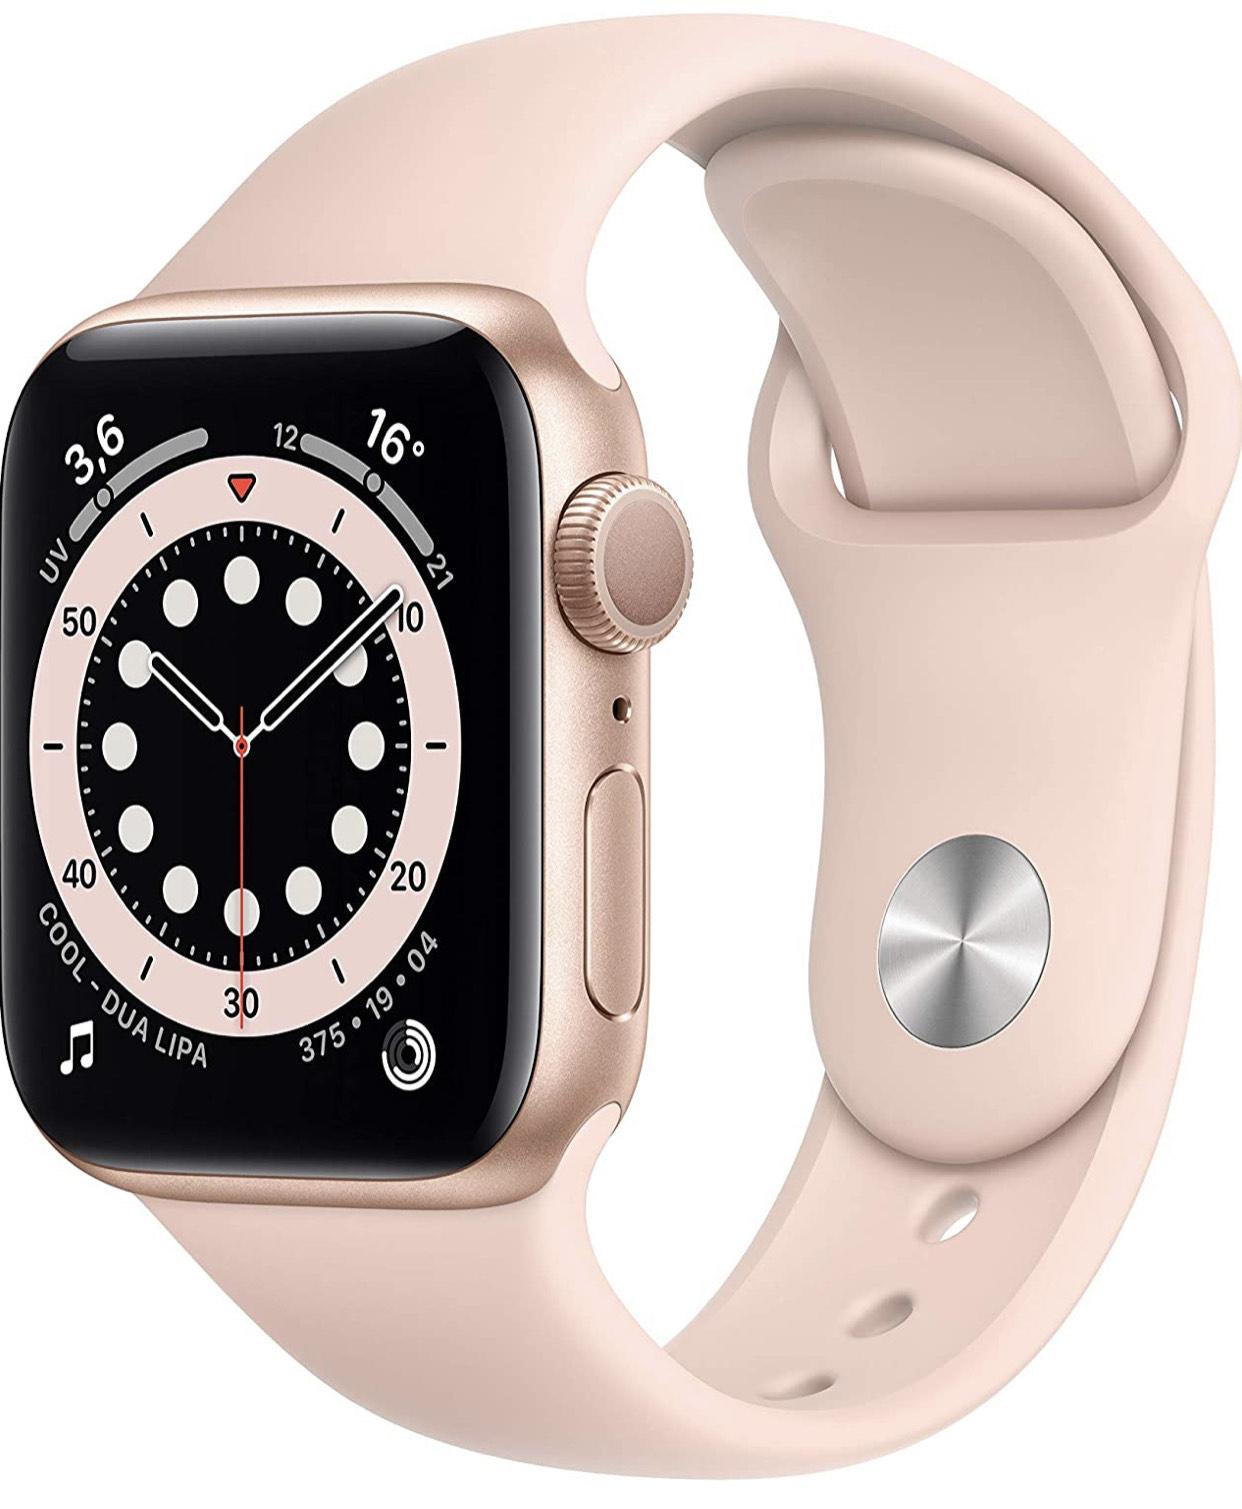 Apple Watch rosé gold 40mm